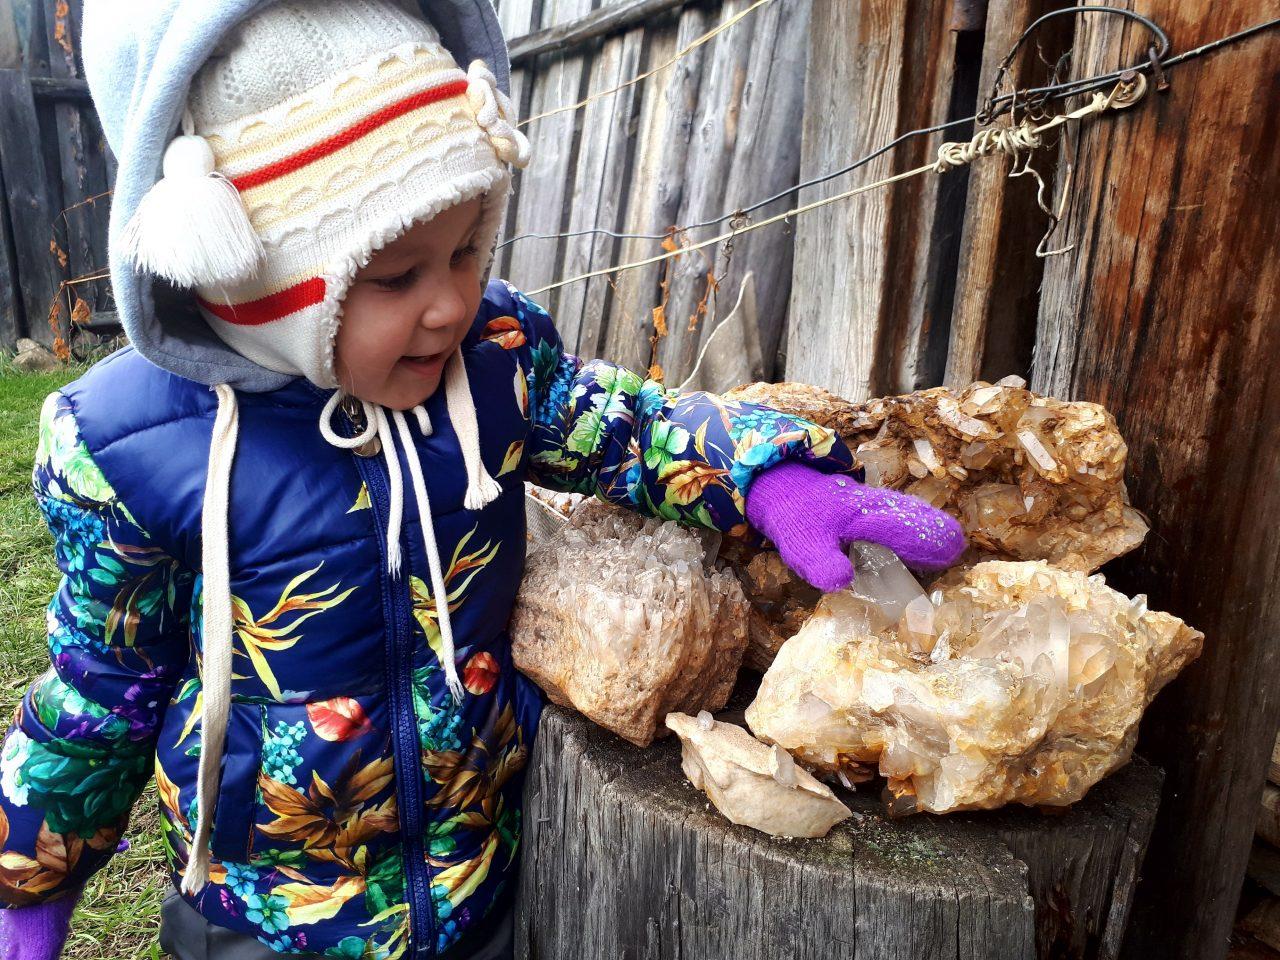 Минералогический туризм в Башкирии: Белорецк, Кага, Верхний Авзян